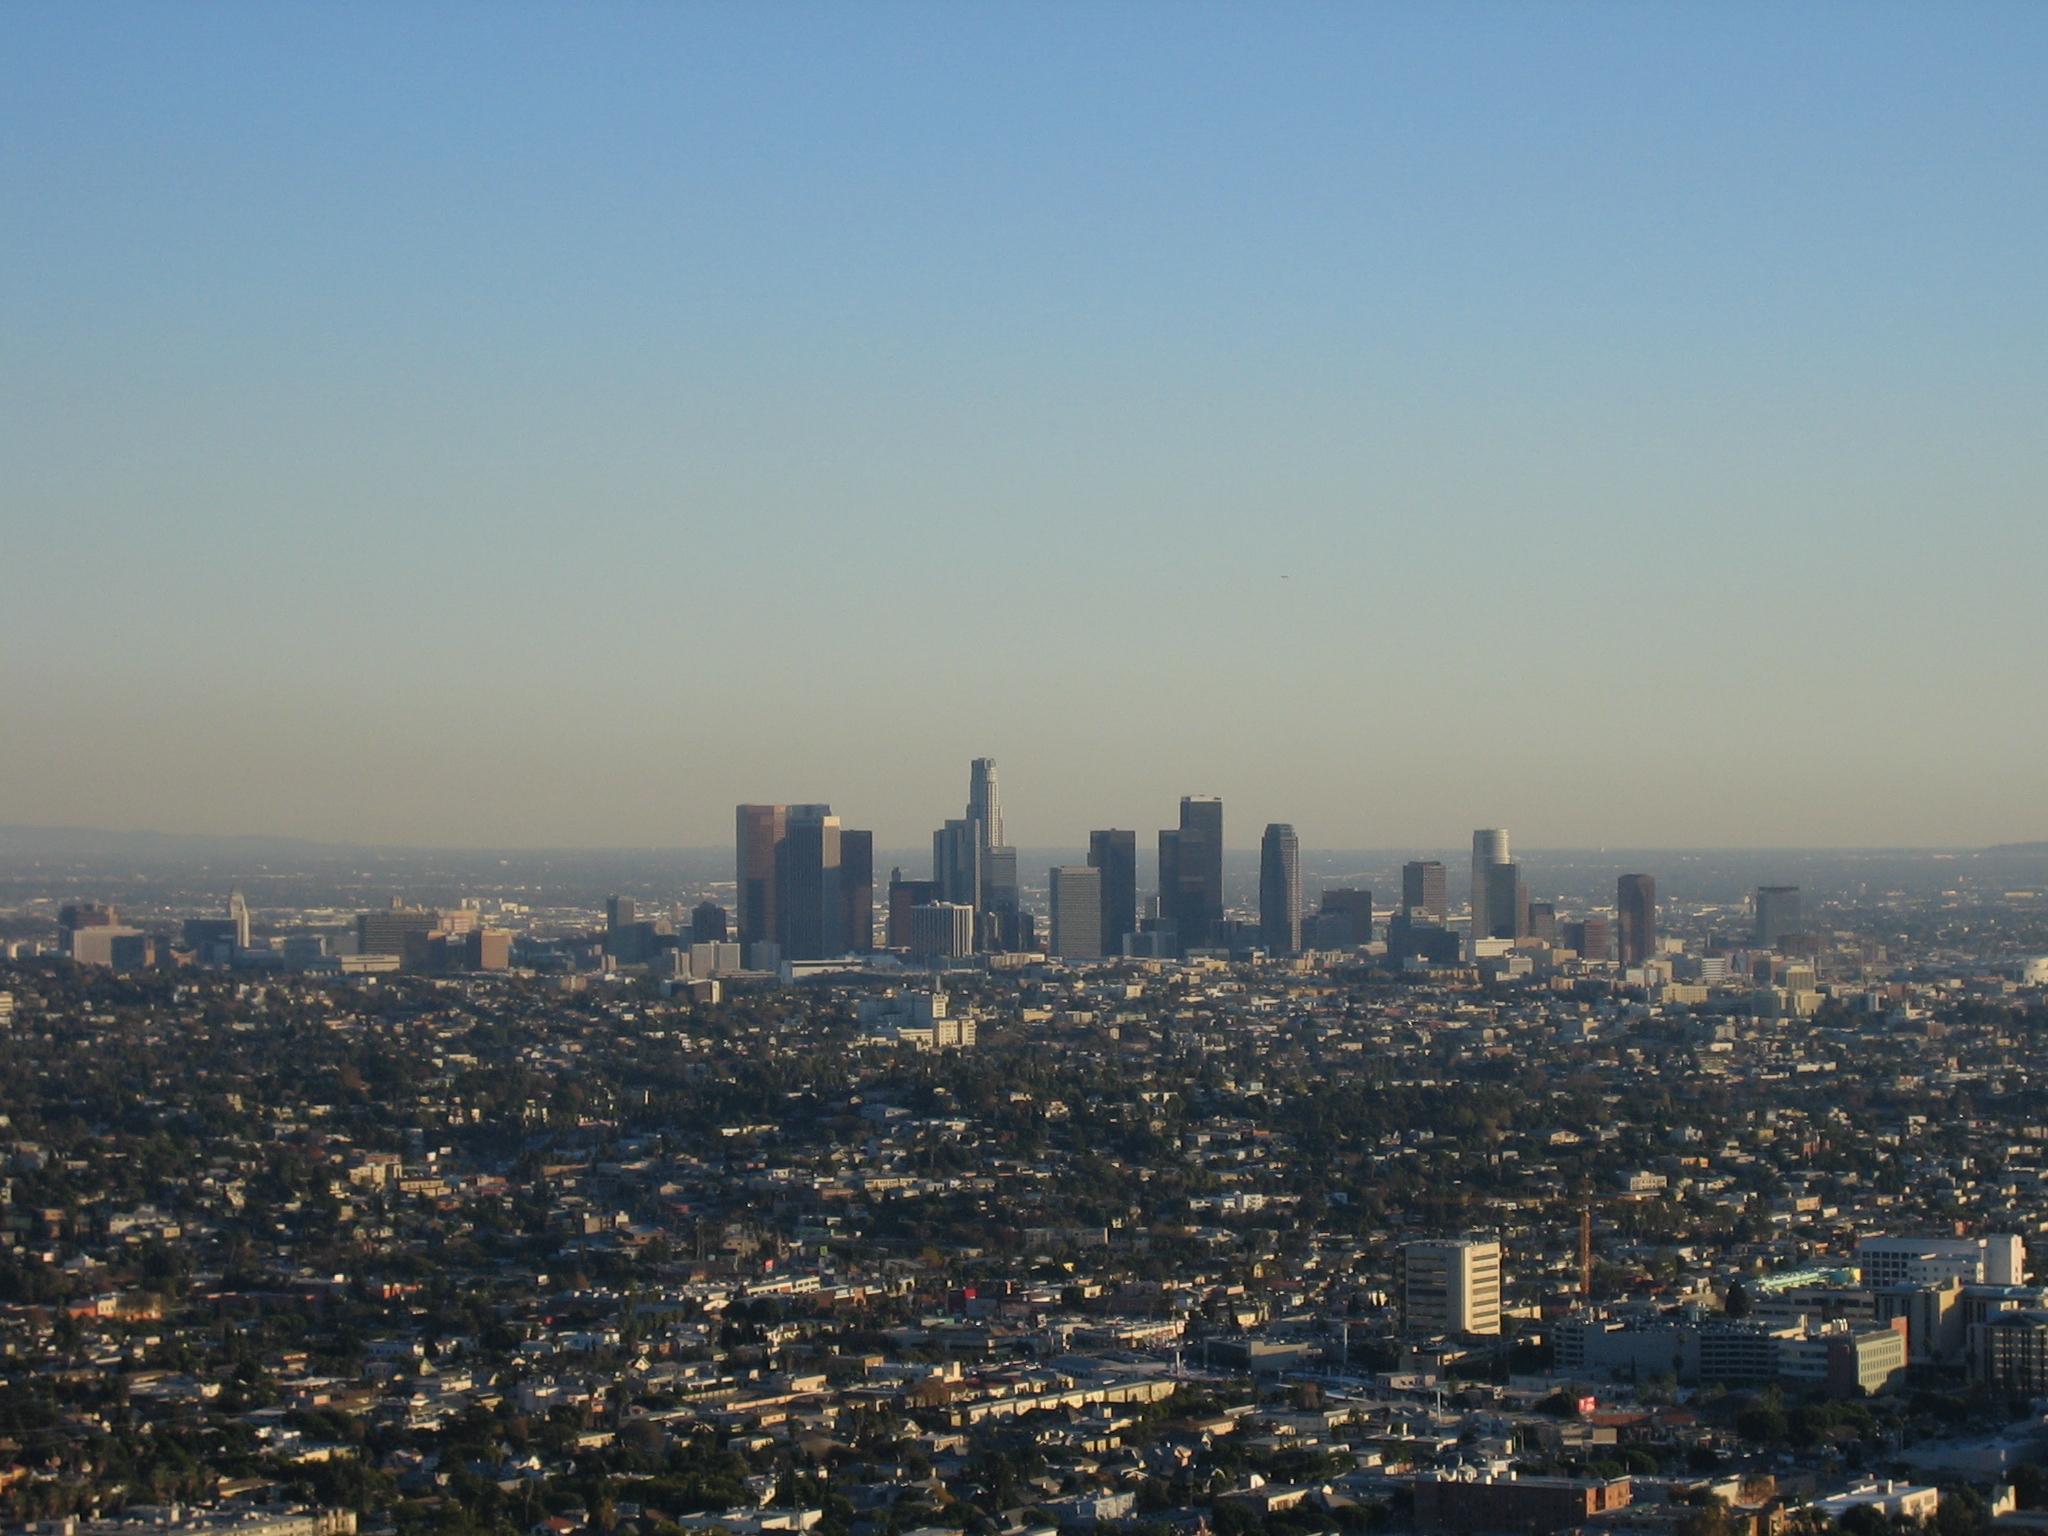 Lands in Los Angeles